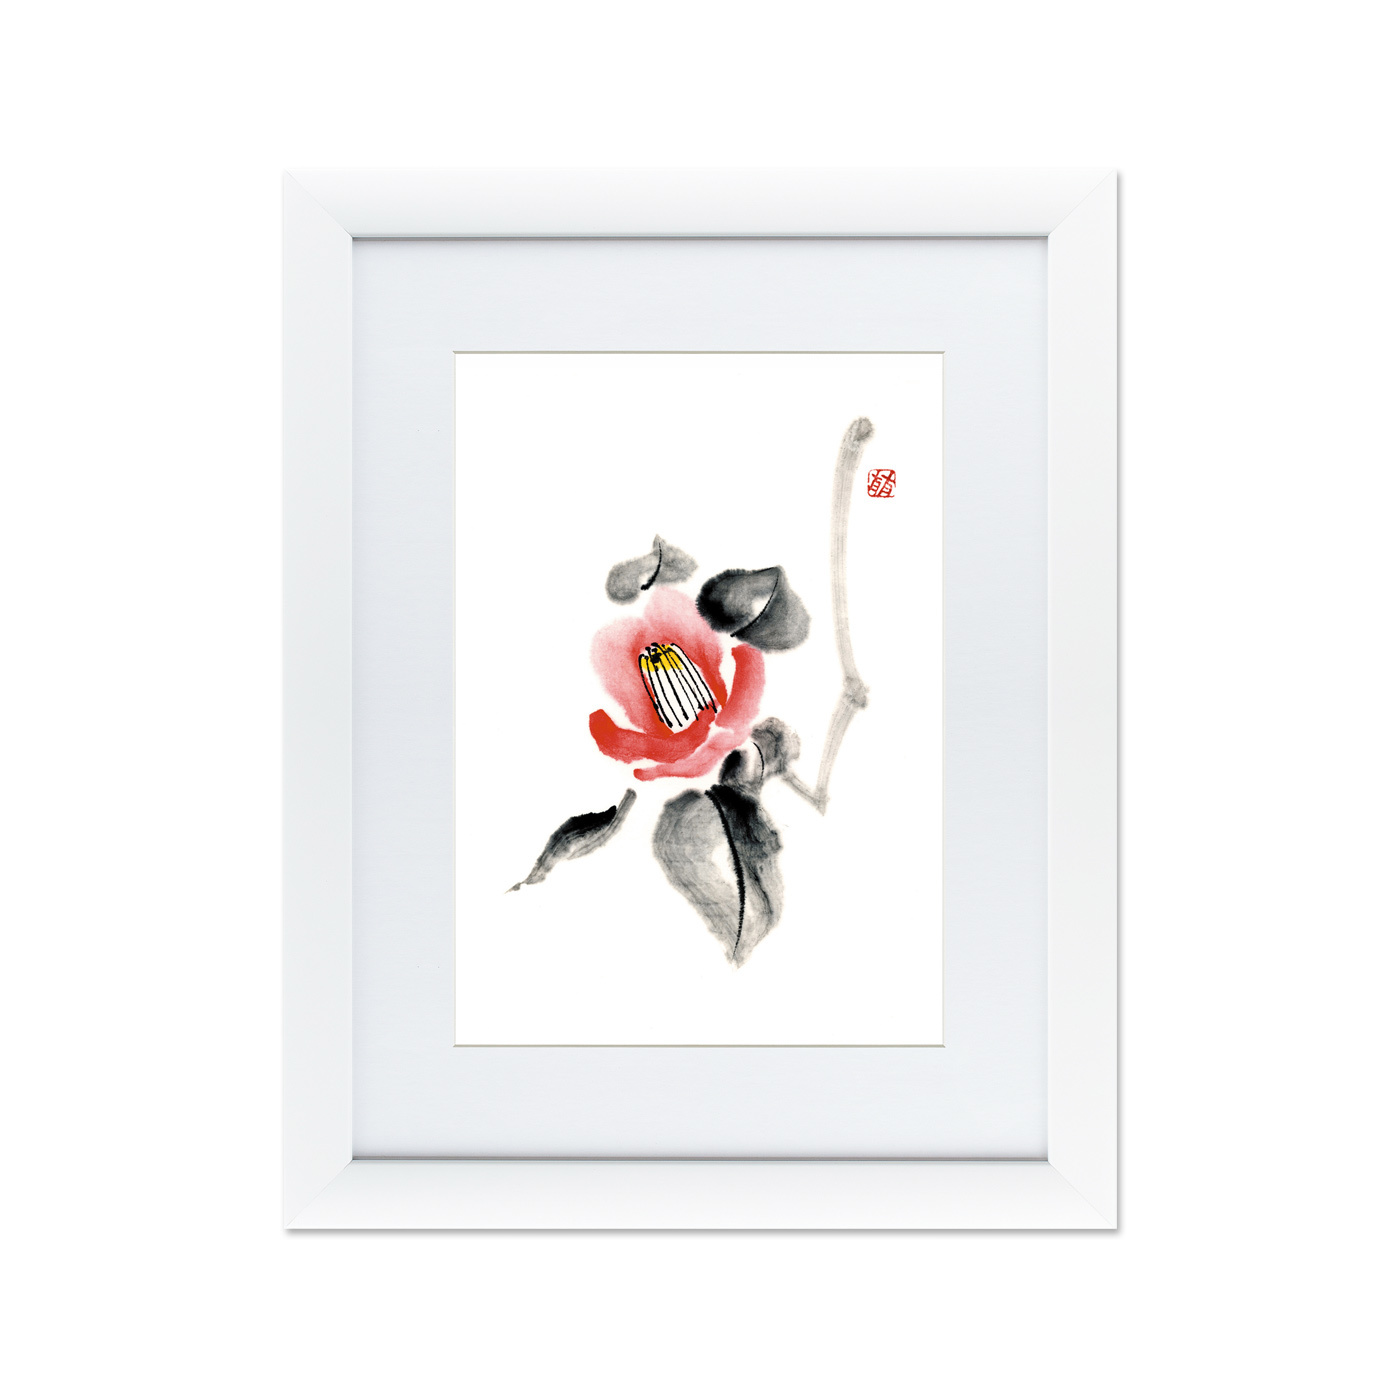 {} Картины в Квартиру Картина Японская Акварель Суми-э, №2 (47х60 см) картины в квартиру картина каллы 2 35х35 см